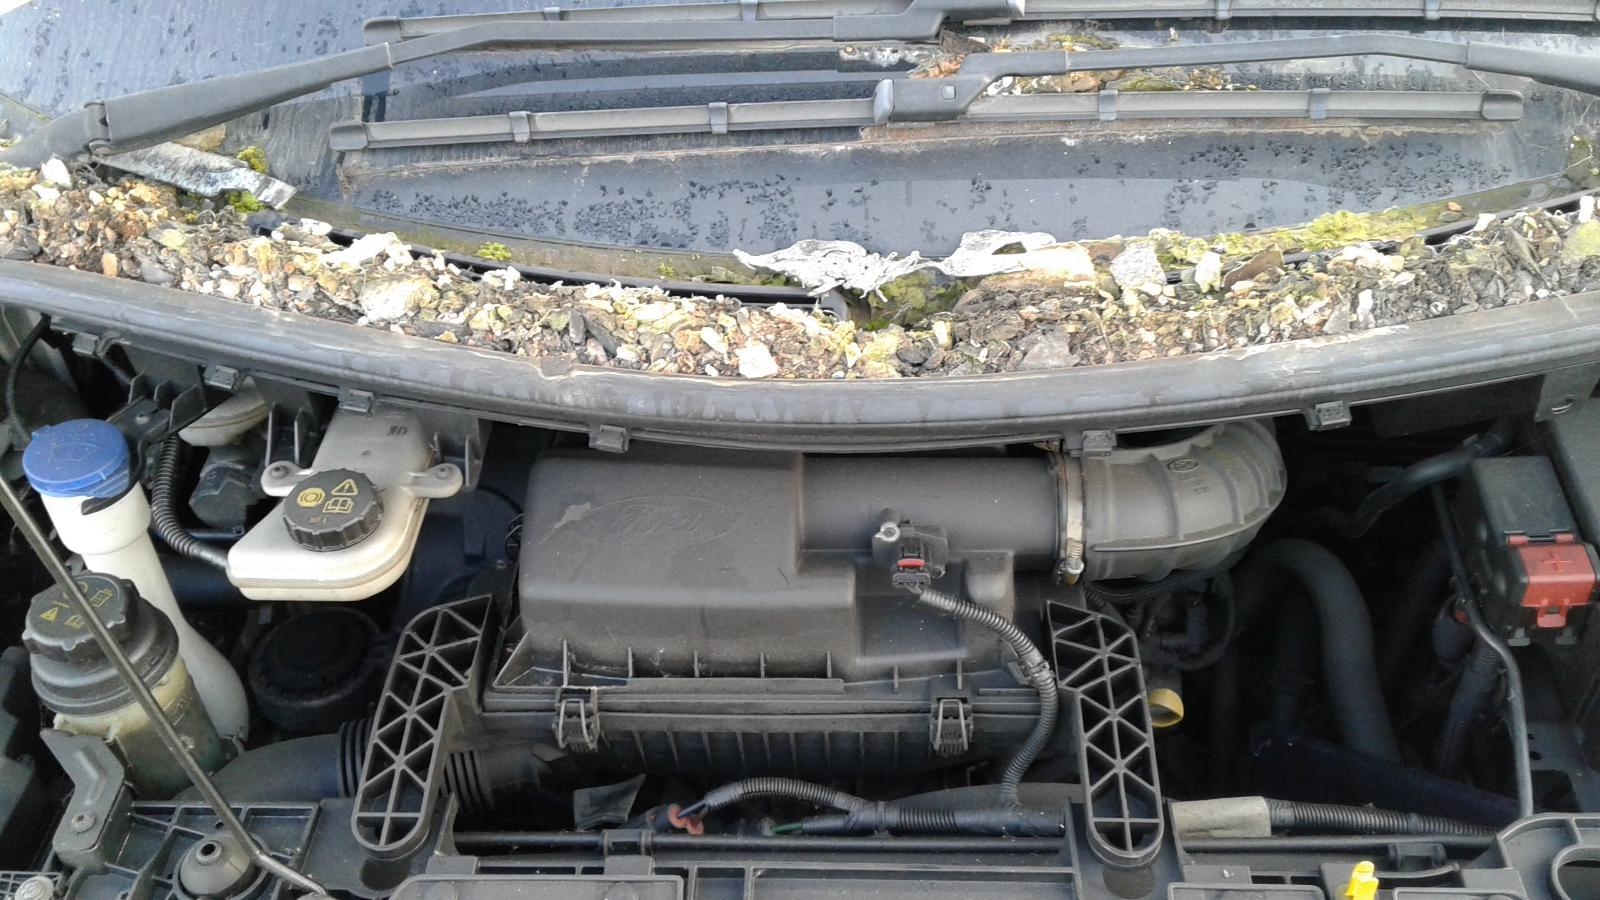 2016 FORD TRANSIT CUSTOM 270 LR Image